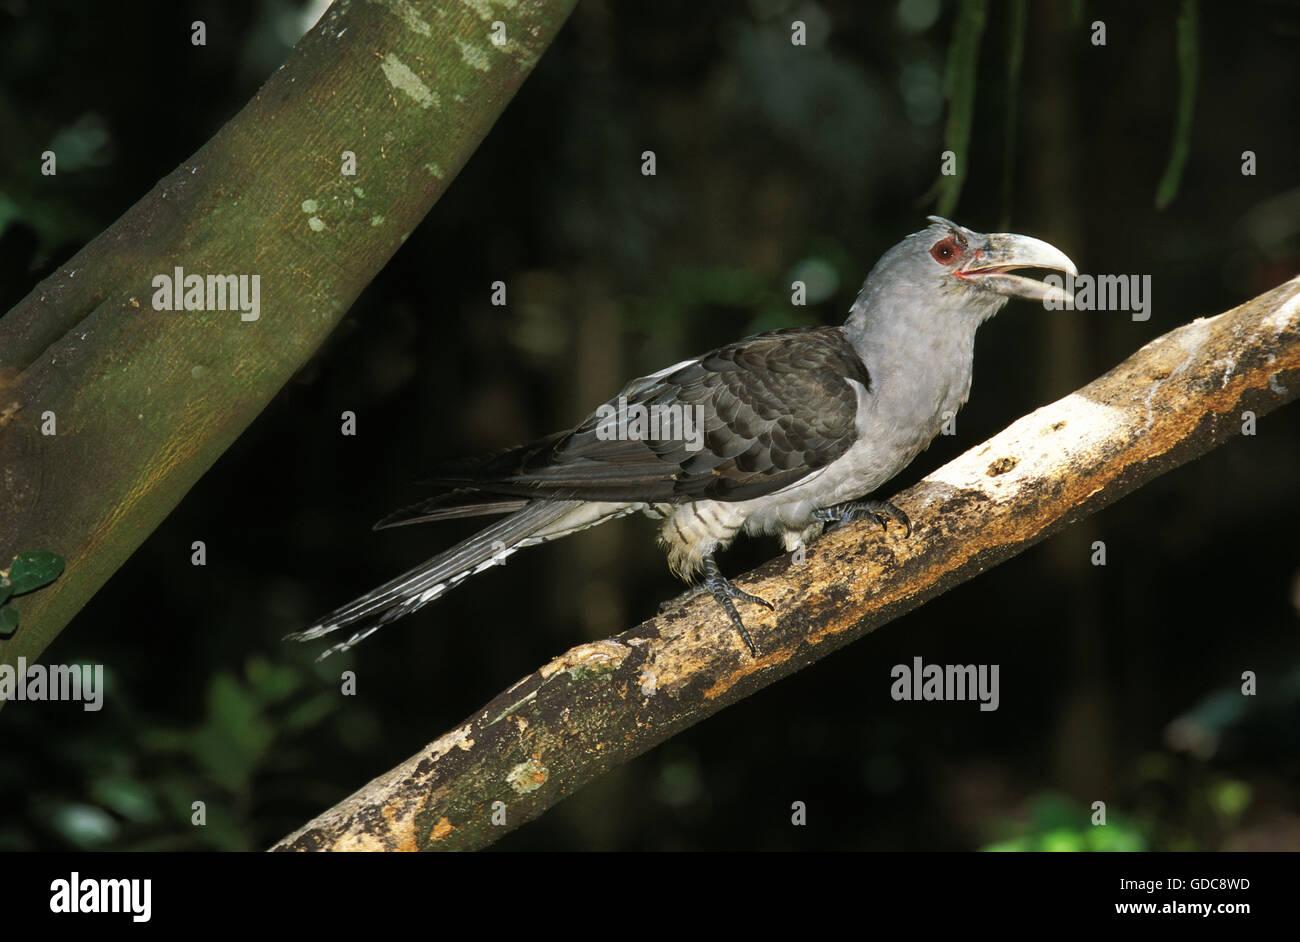 Channel-Billed Cuckoo, scythrops novaehollandiae, Adult on Branch - Stock Image